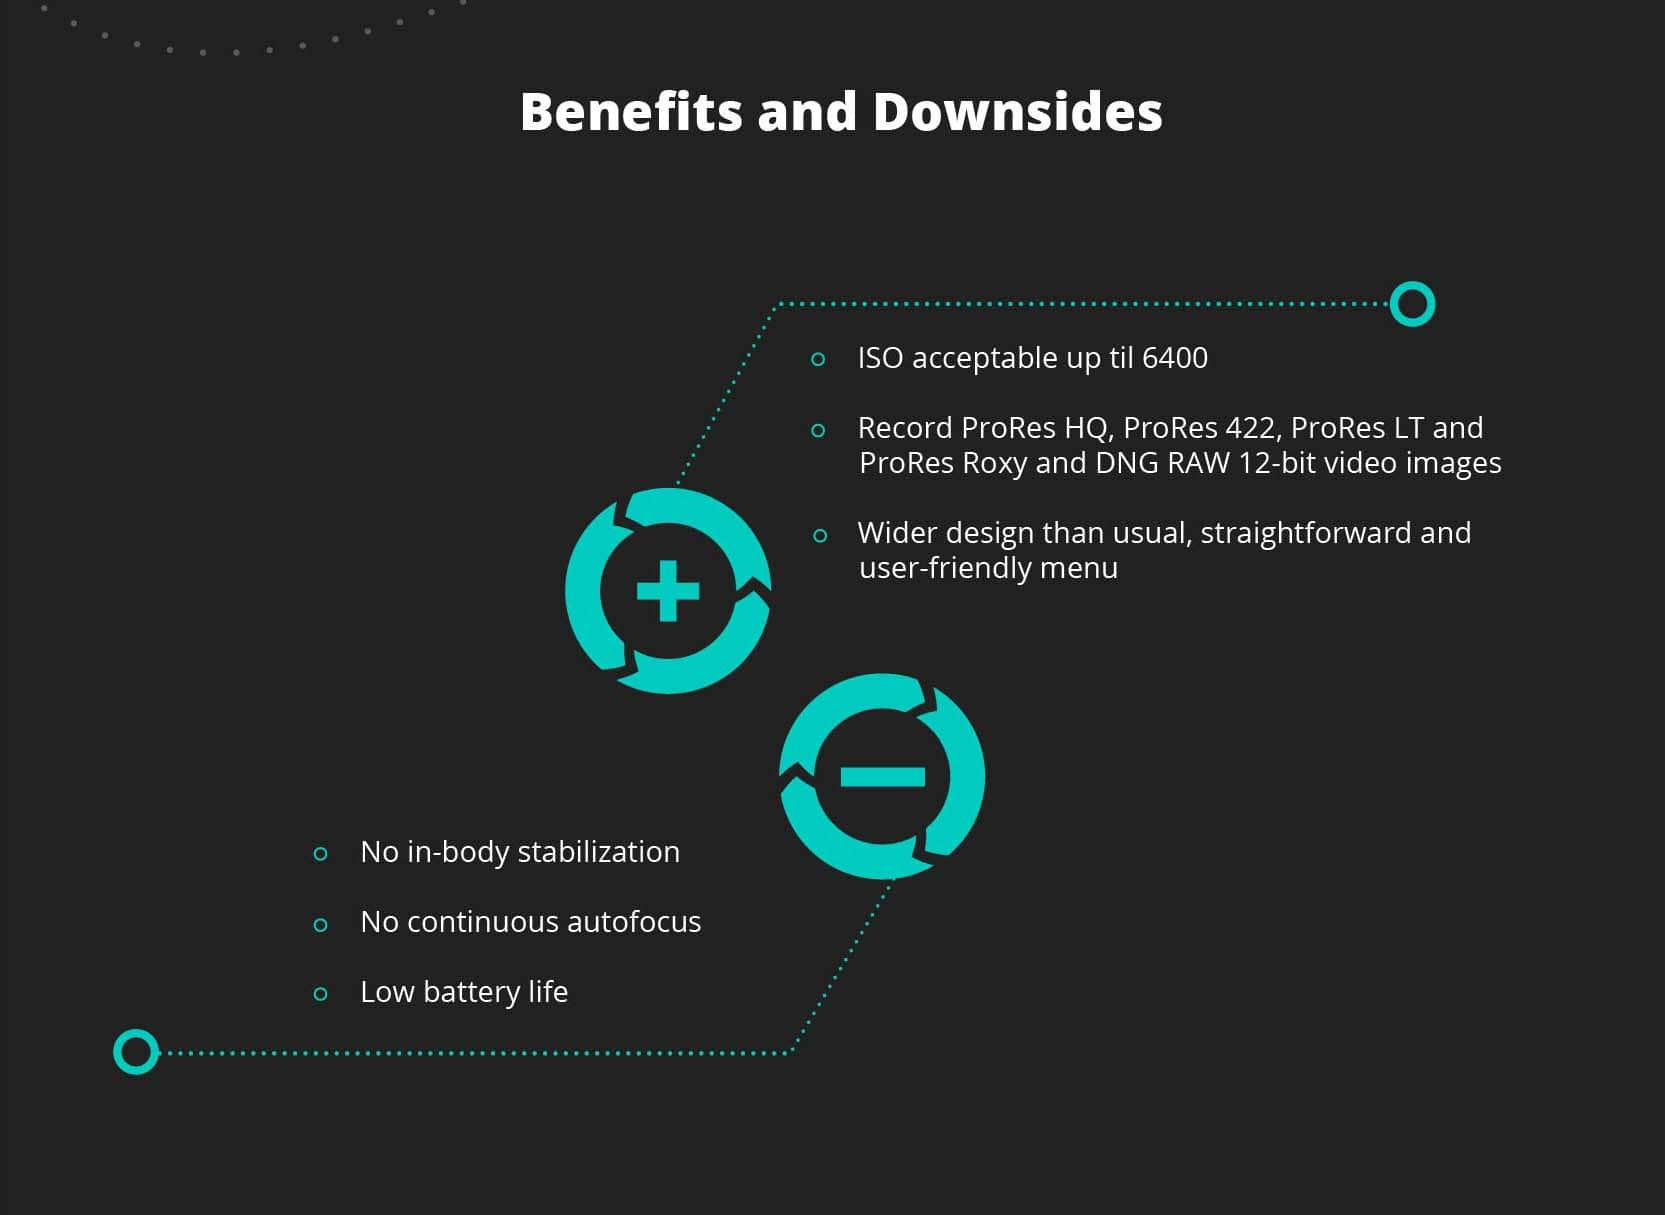 summary, benefits and downsides with the Blackmagic Pocket Cinema Camera 4K